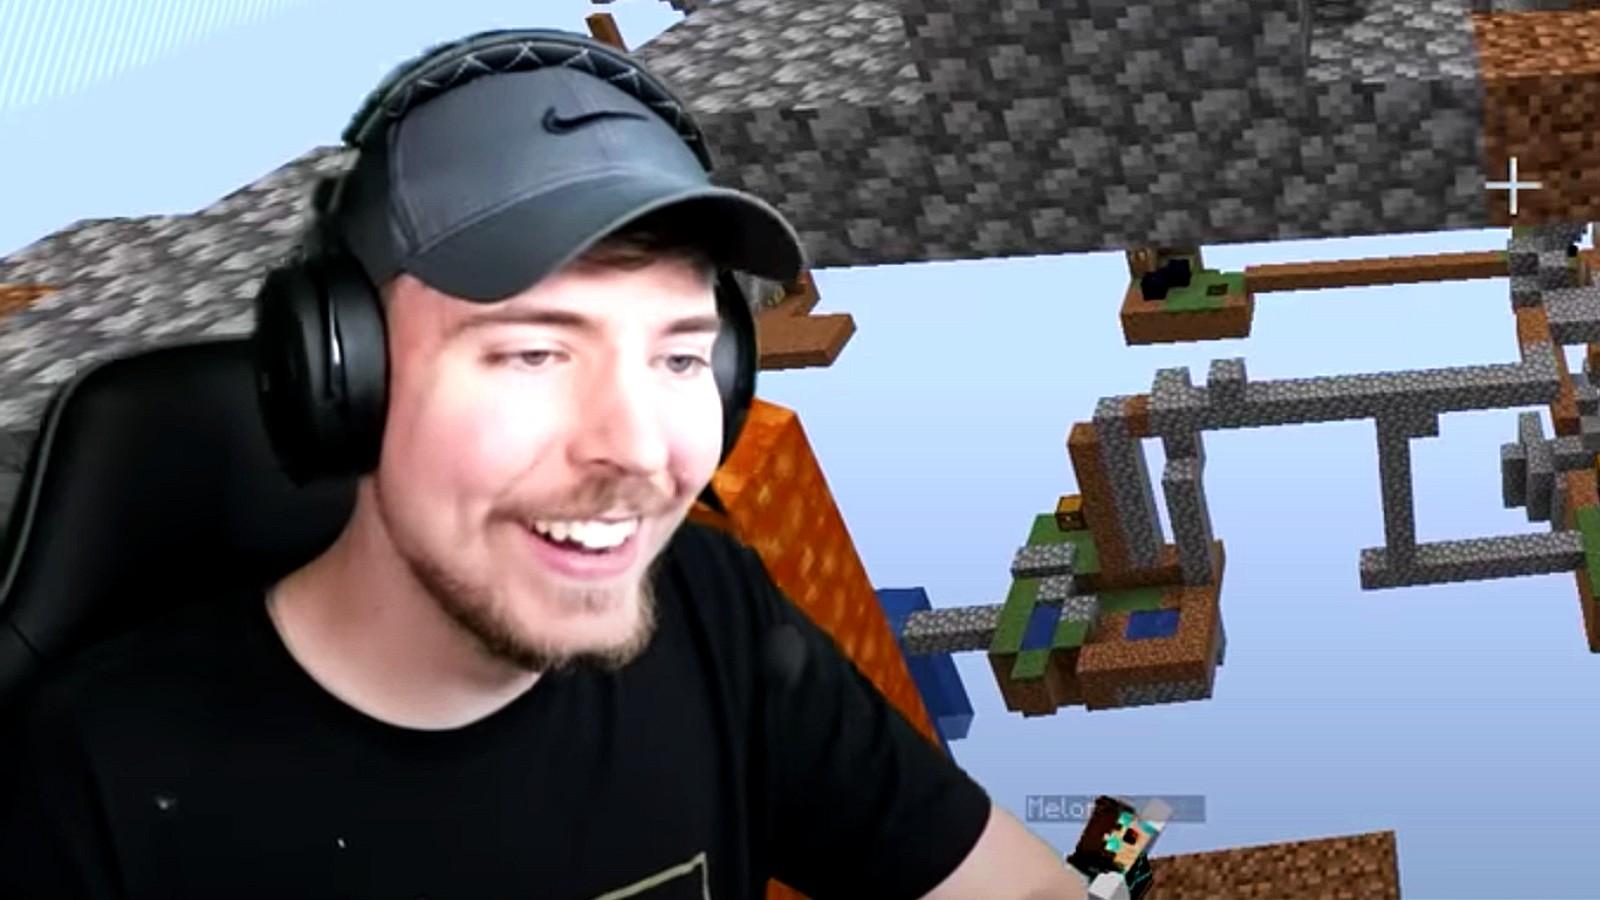 MrBeast in Minecraft YouTube challenge